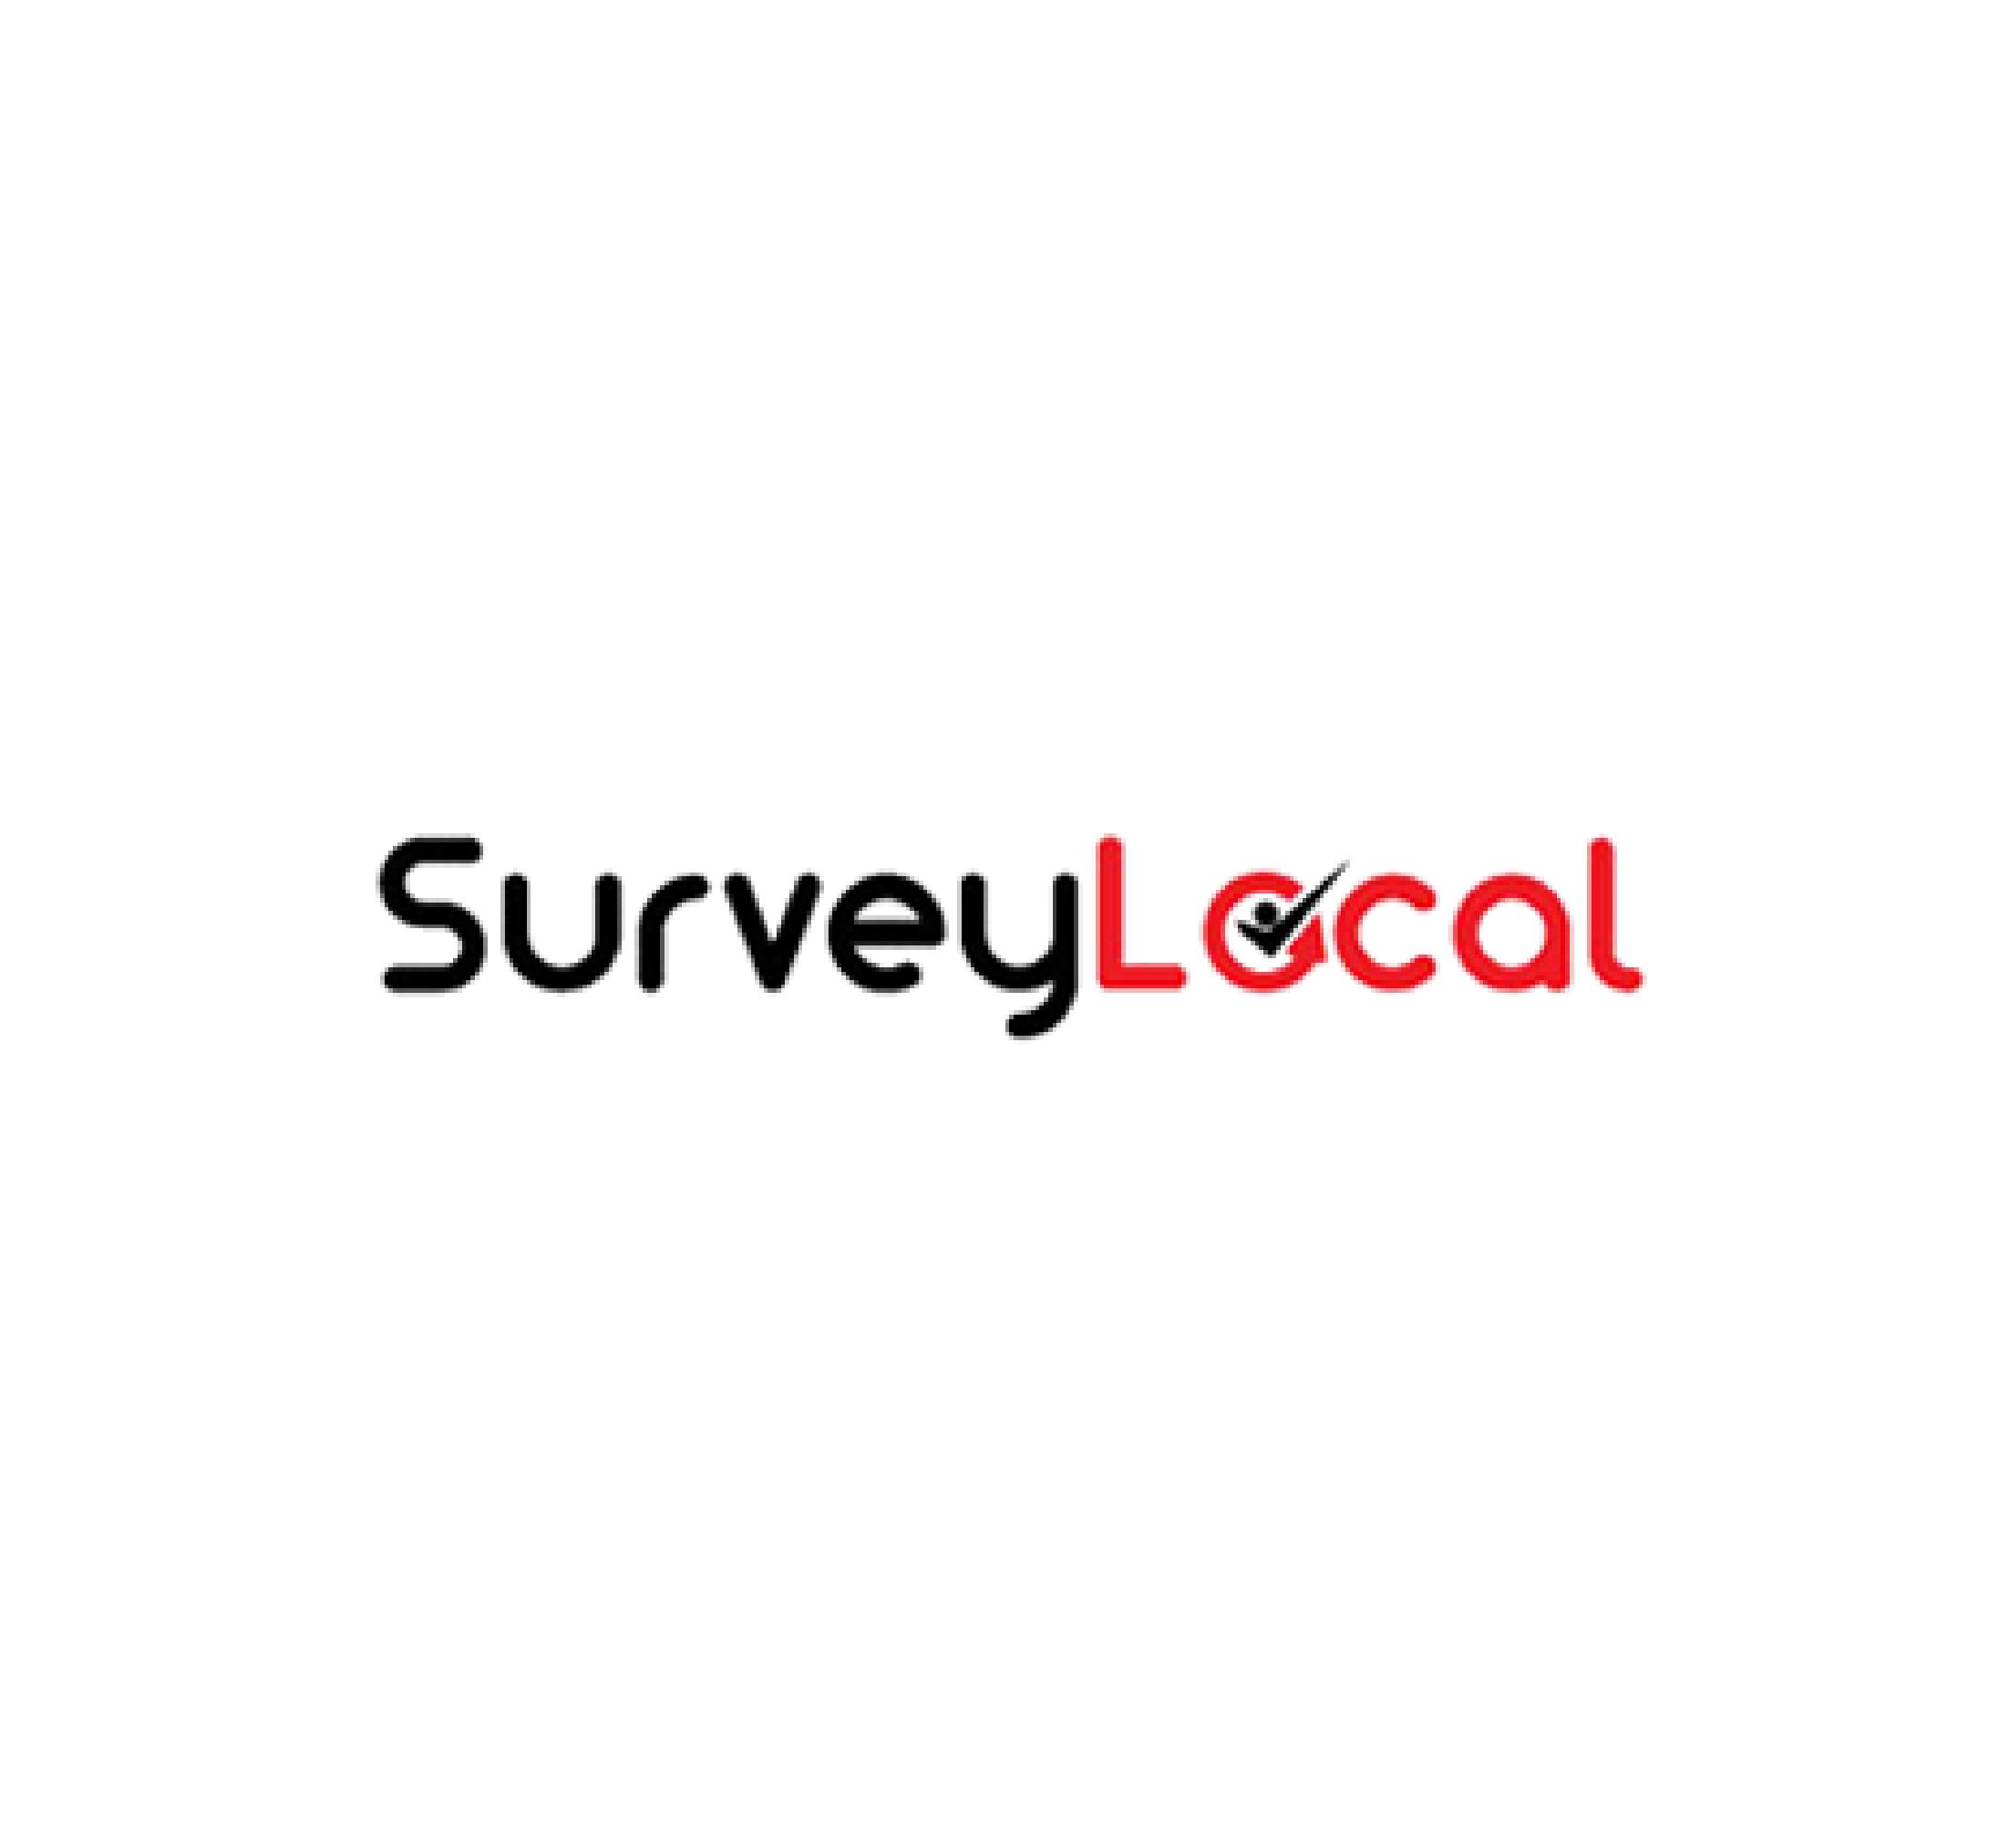 surveylocwebready.png